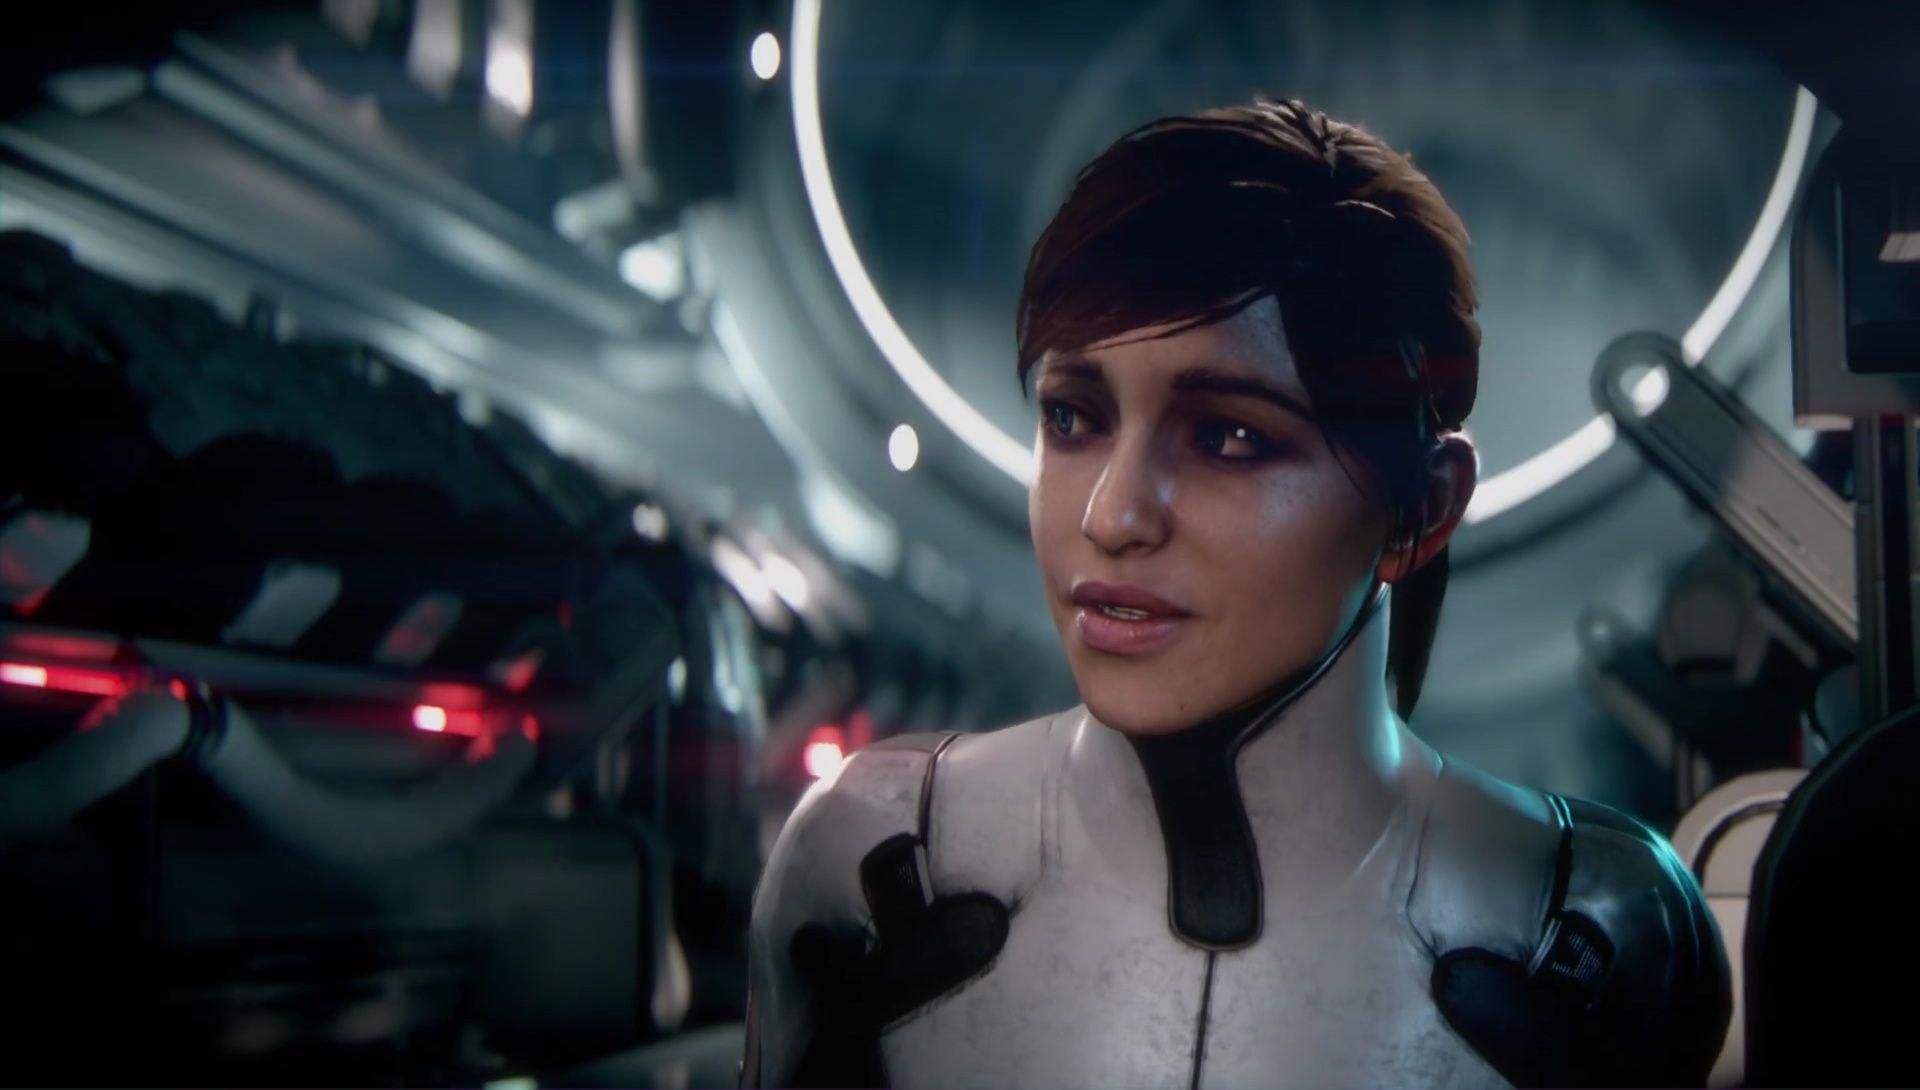 [Mass Effect Andromeda] ผู้ผลิตยืนยัน เกมภาคนี้ร้อนแรงมากกว่าภาคก่อนๆ แน่นอน!!